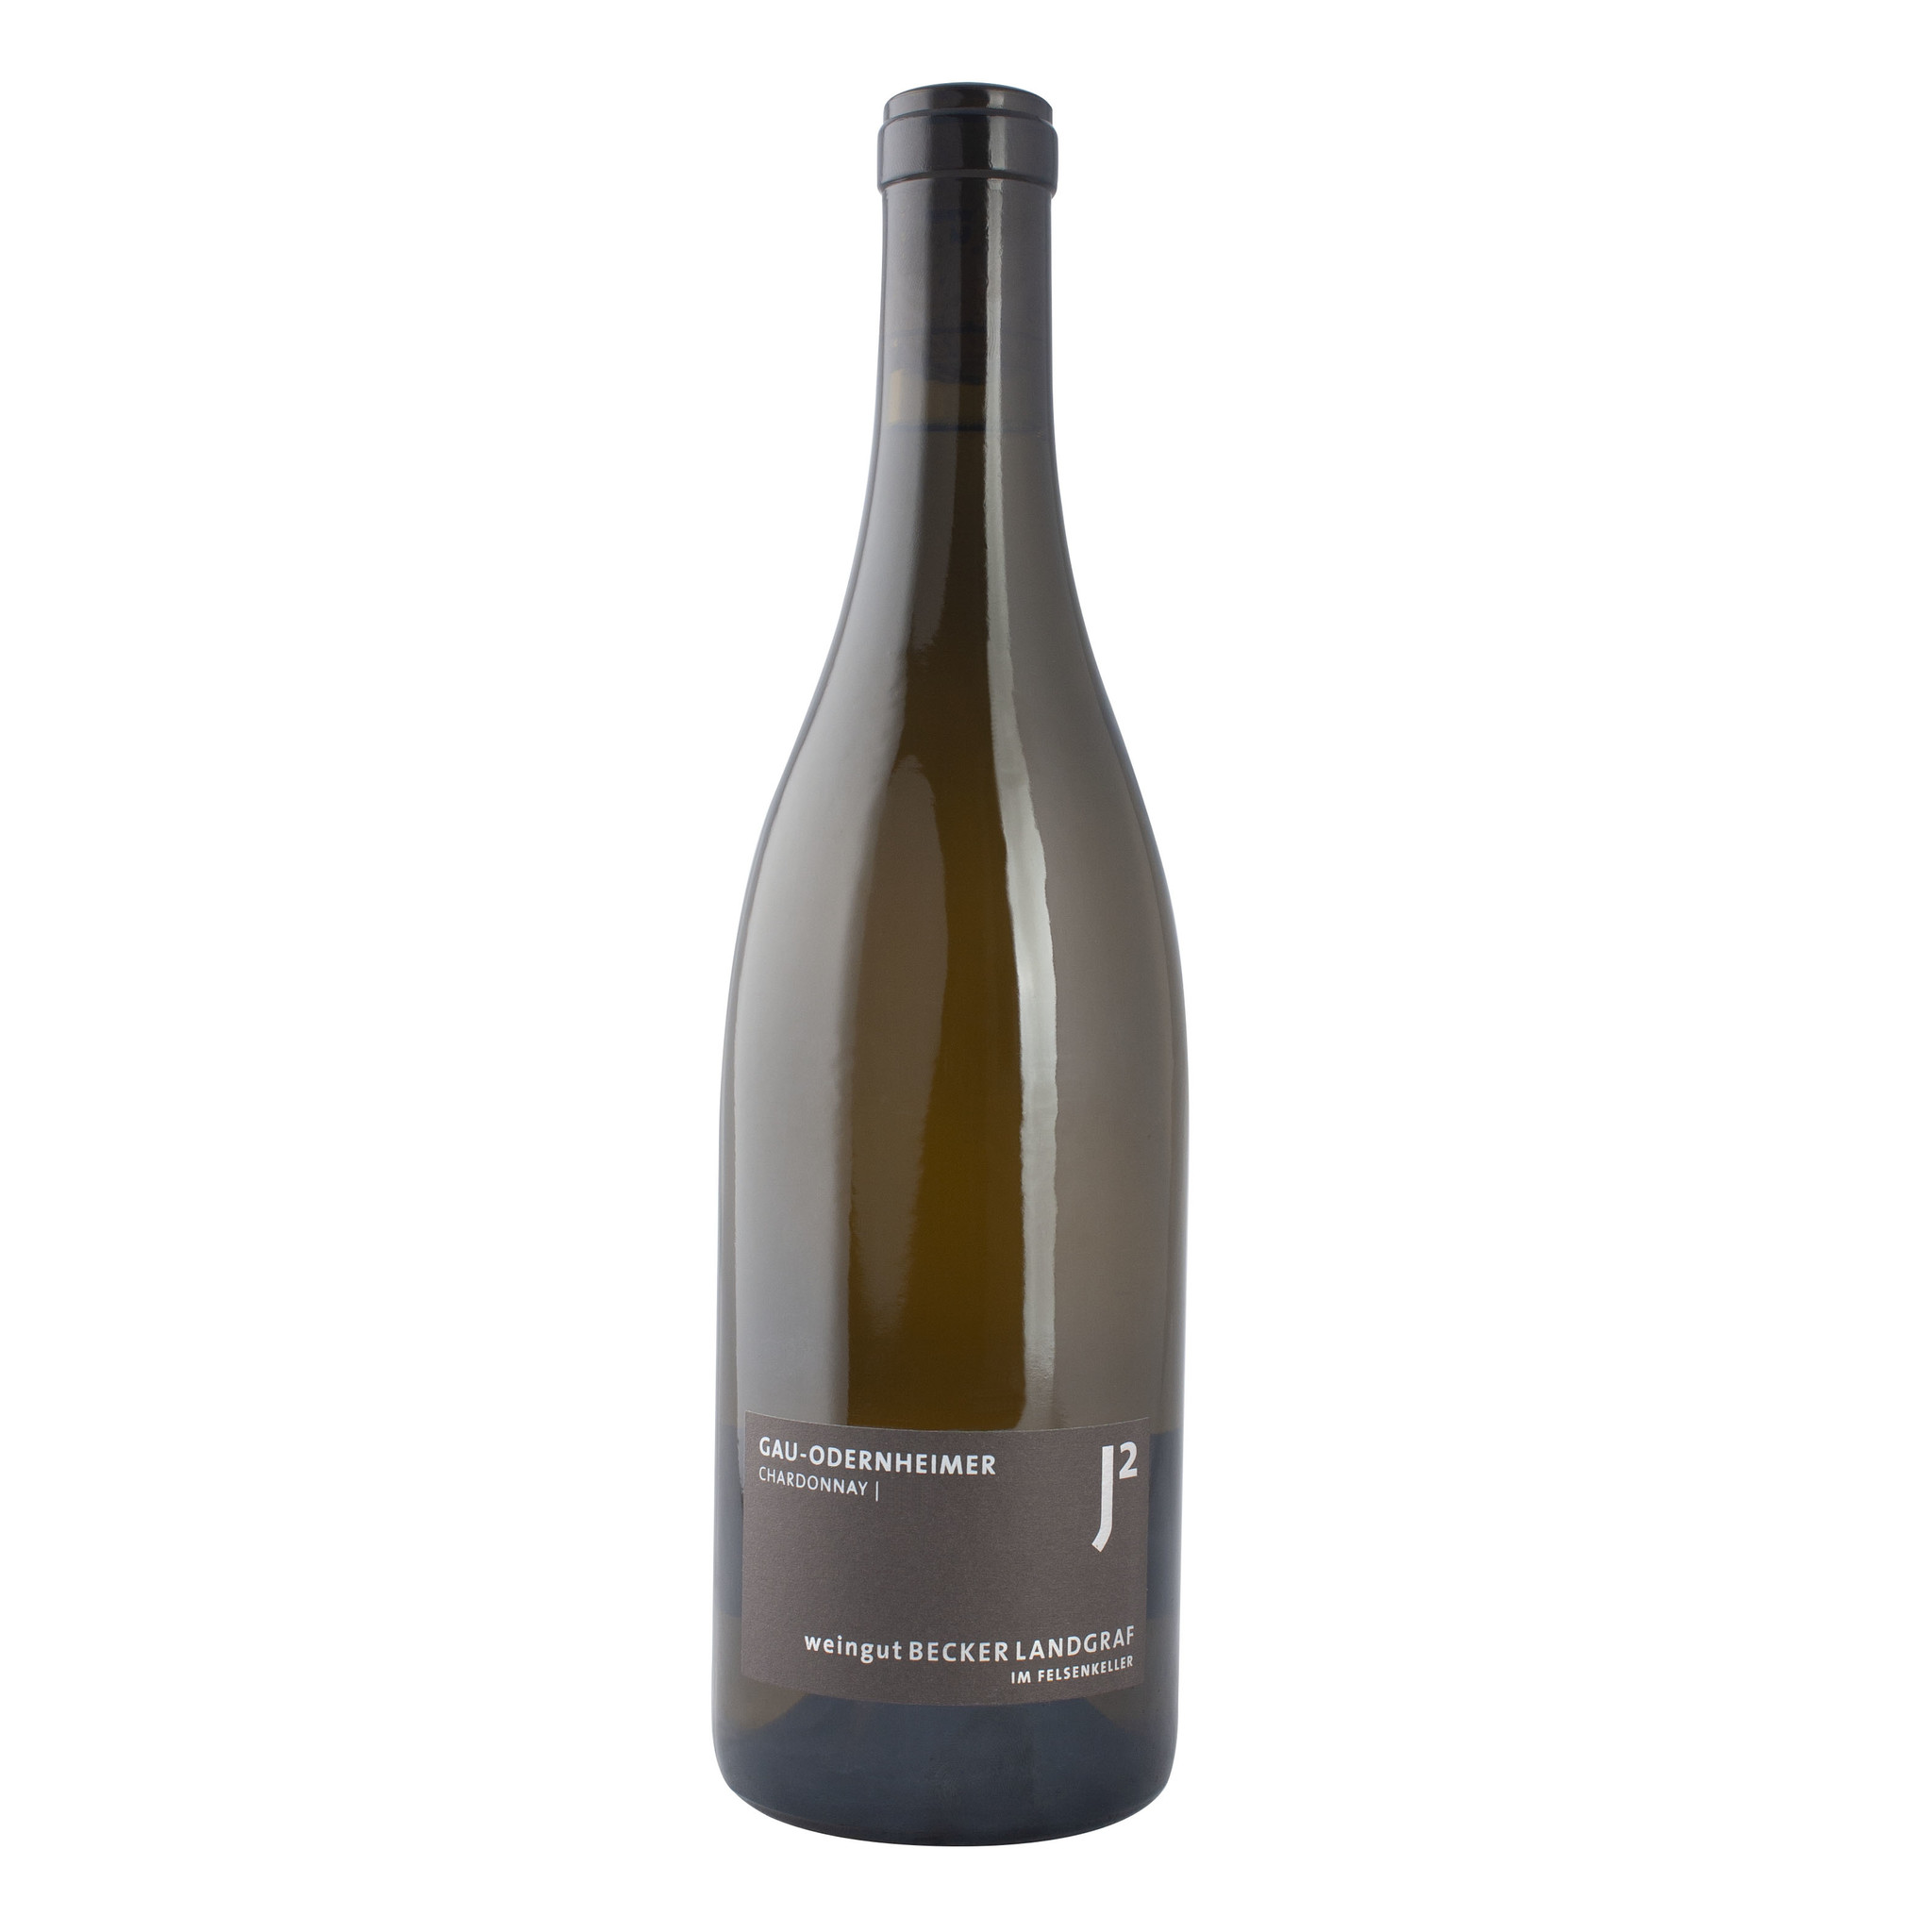 Weingut Becker Landgraf J2 Gau-Odernheimer Chardonnay 2018